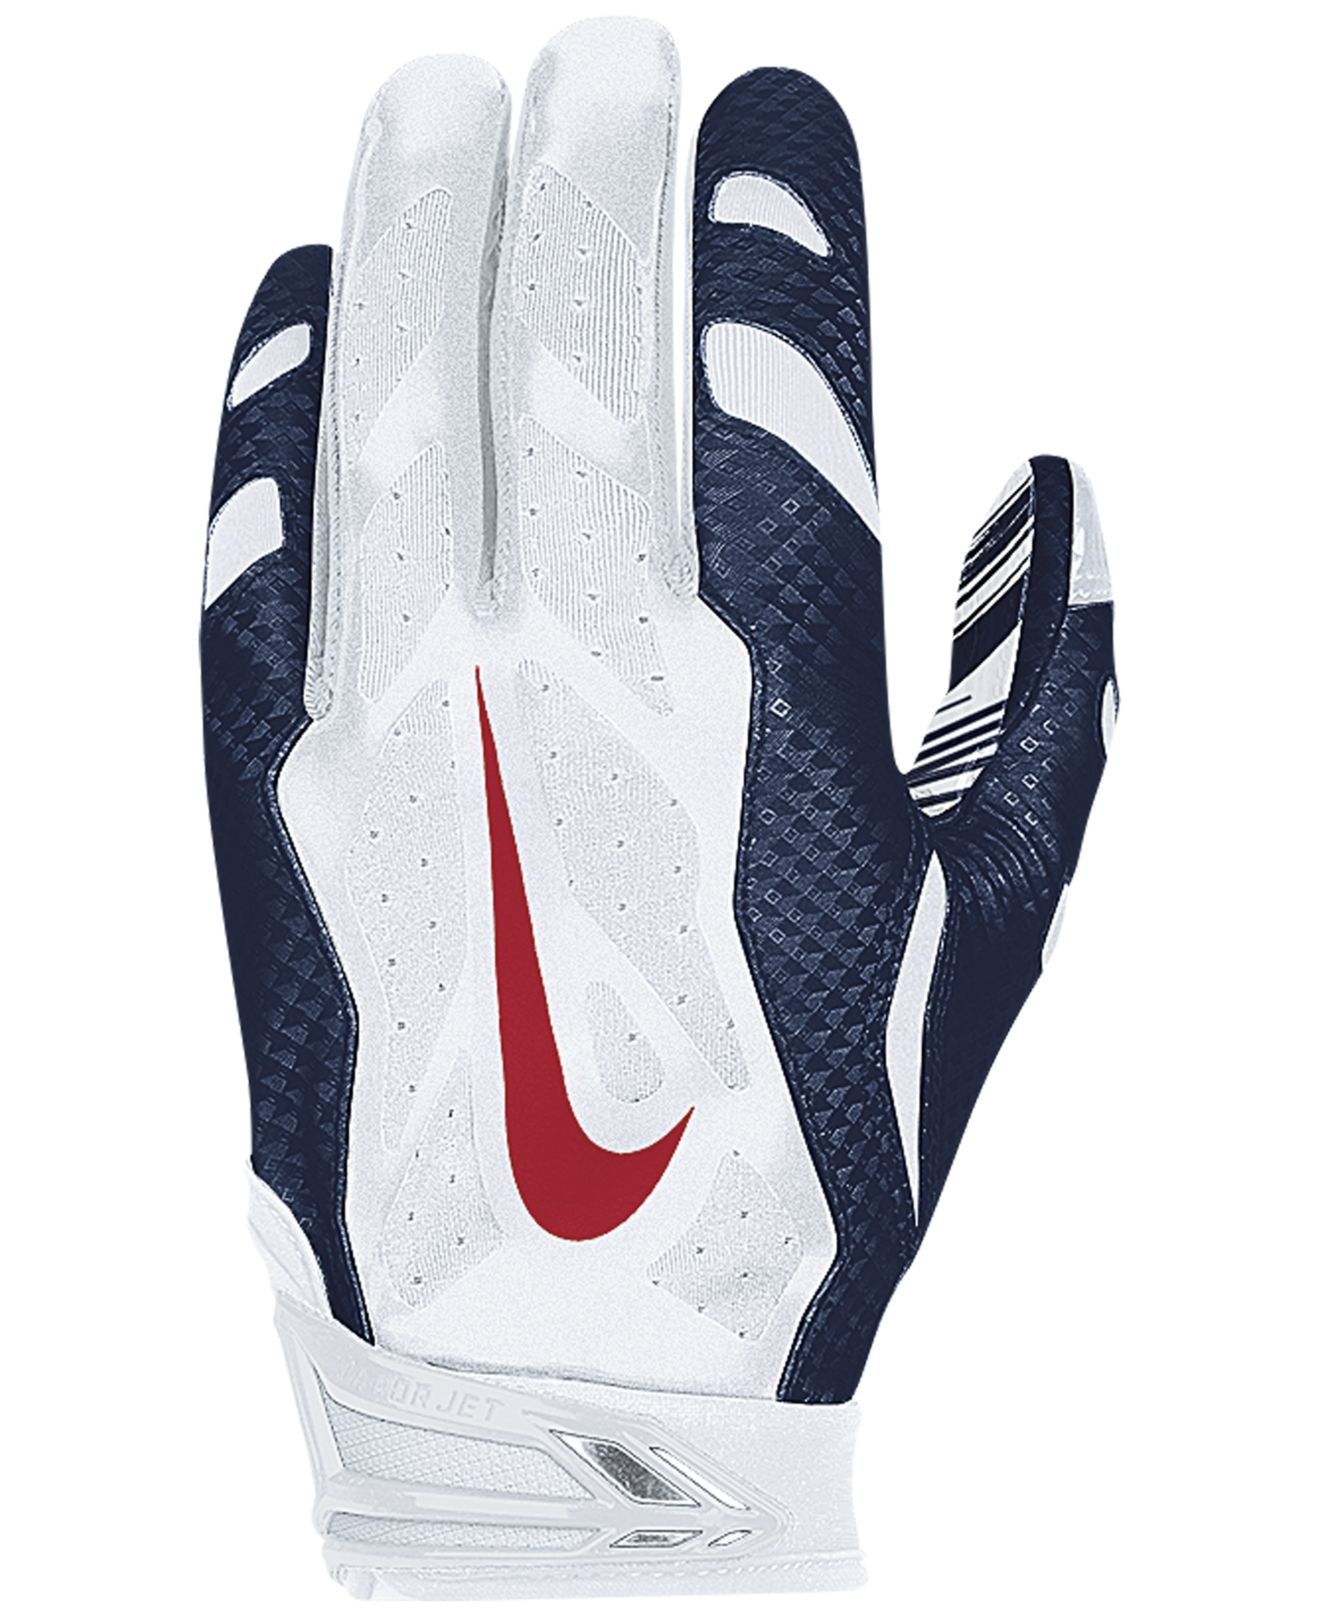 newest 8214f de5cb Men's Blue New England Patriots 30 Vapor Jet Gloves